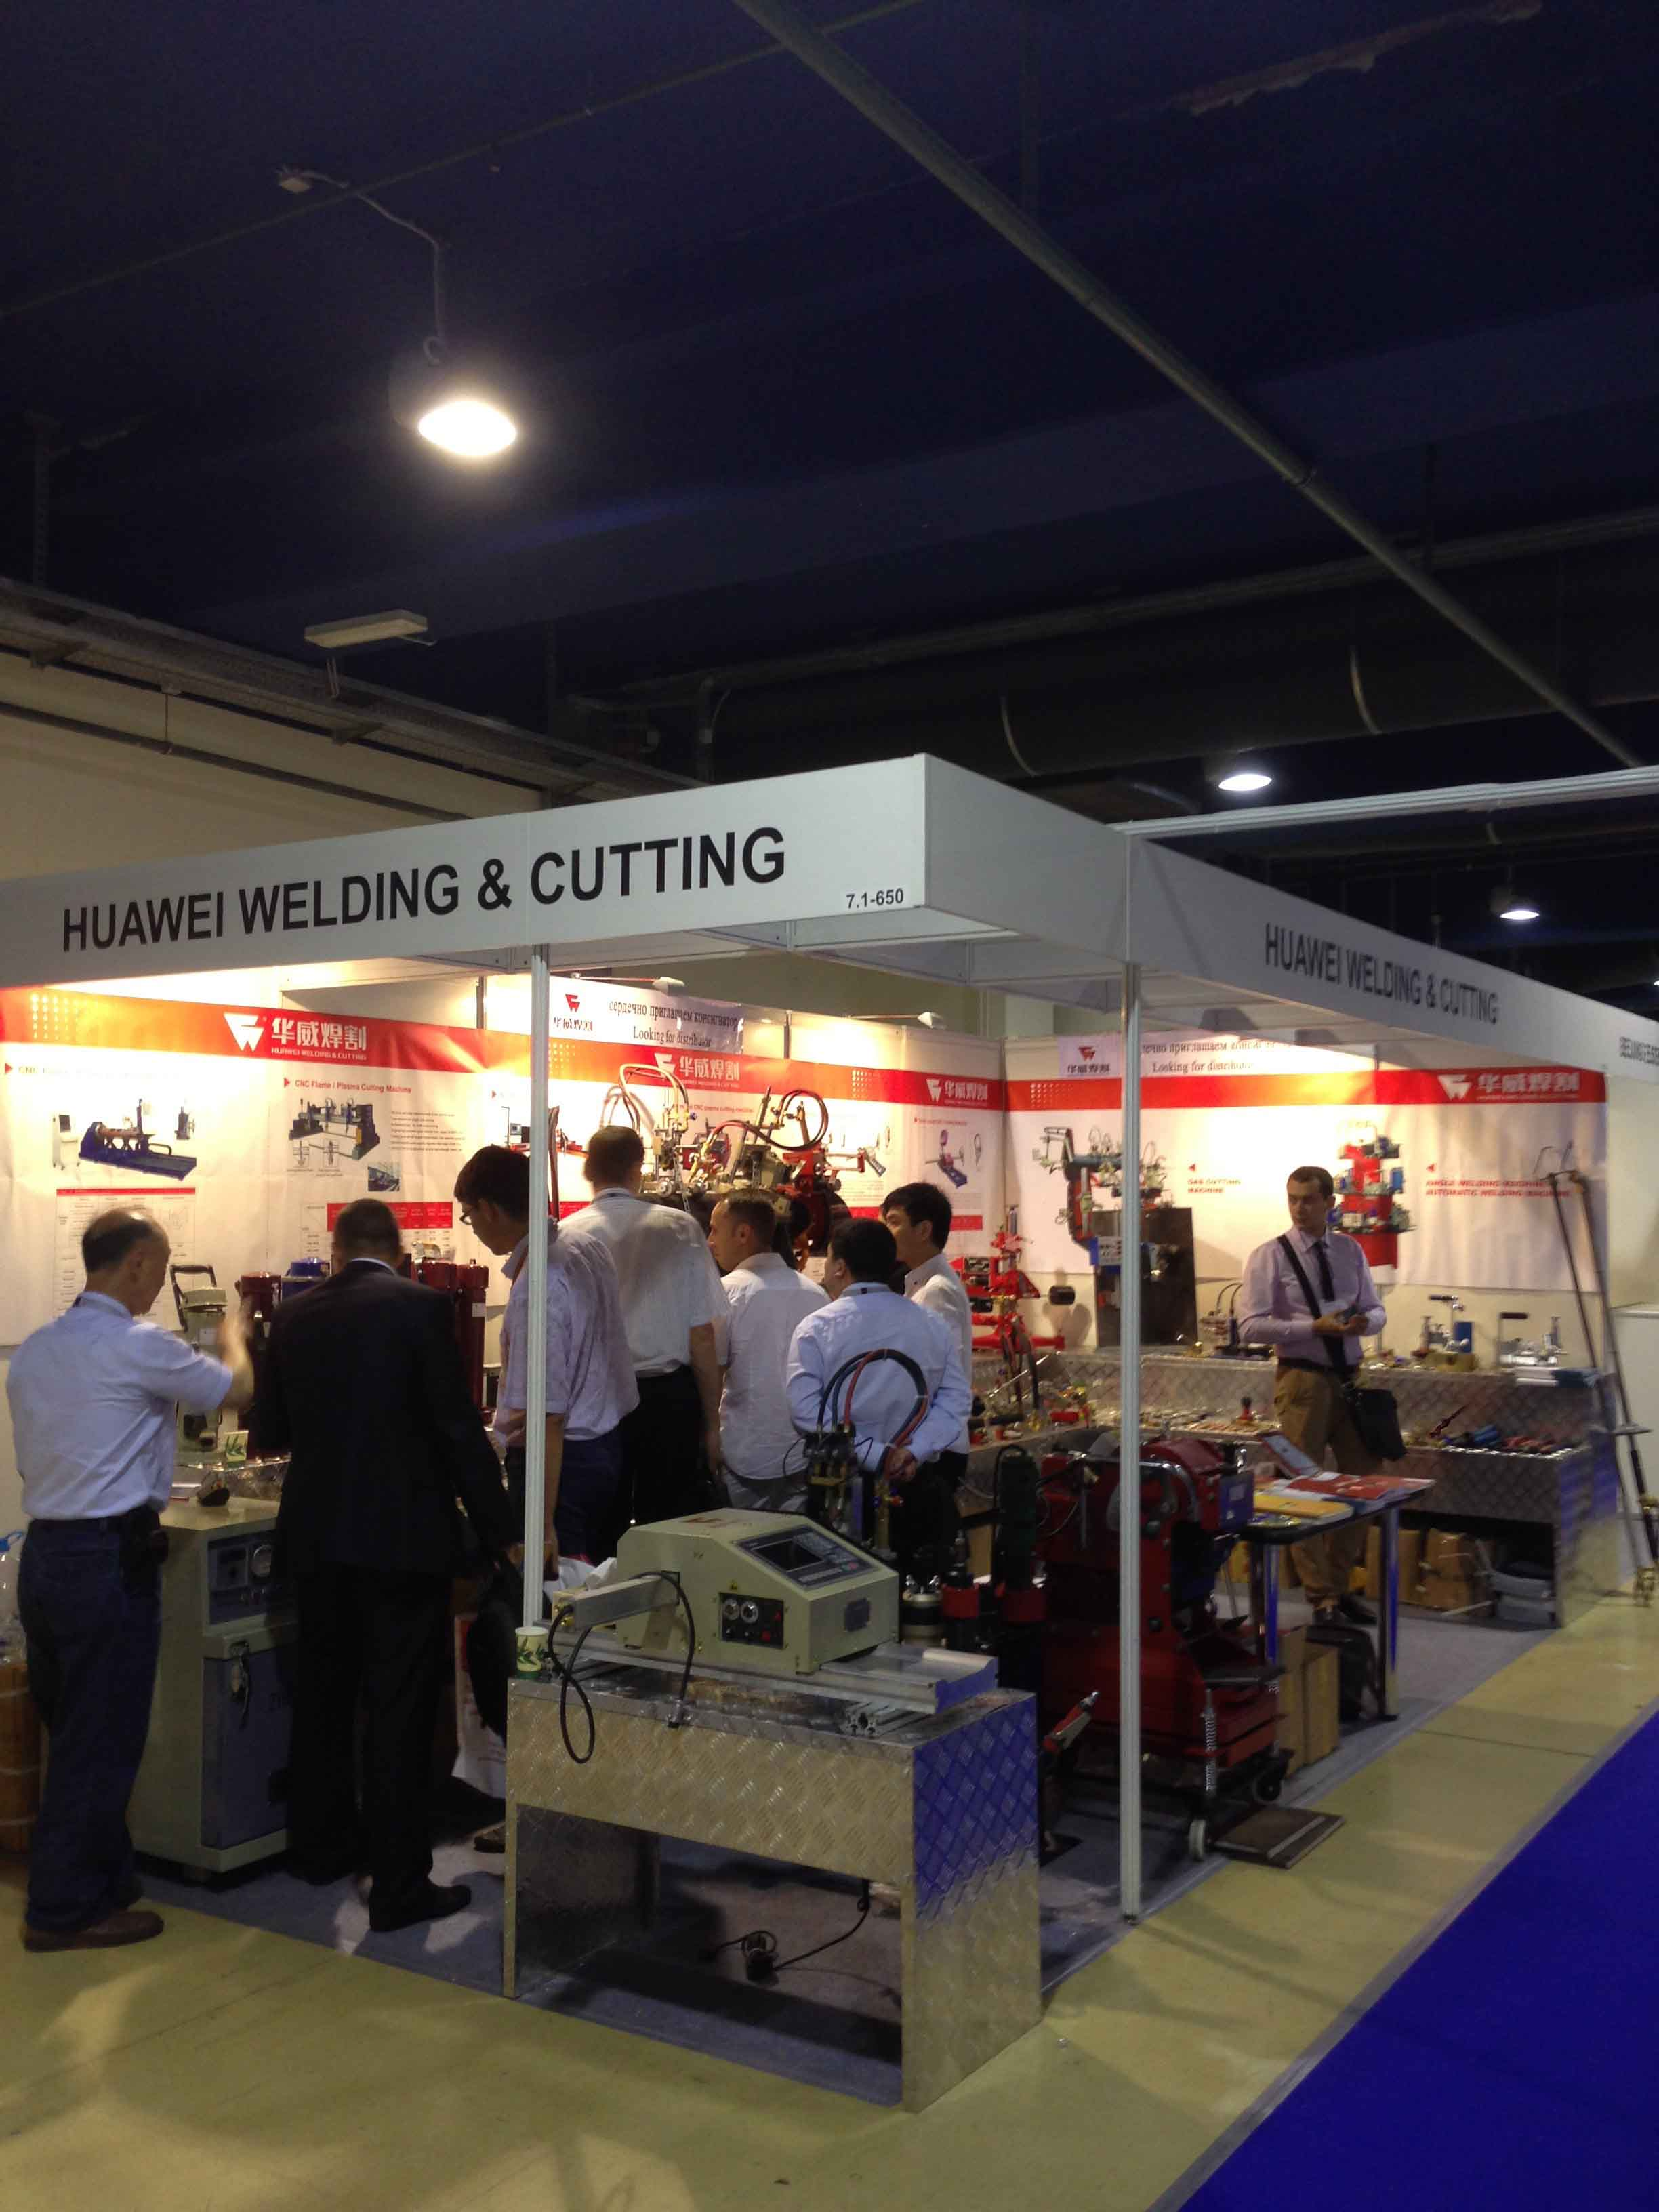 HUAWEI attend Russia essen welding & cutting show